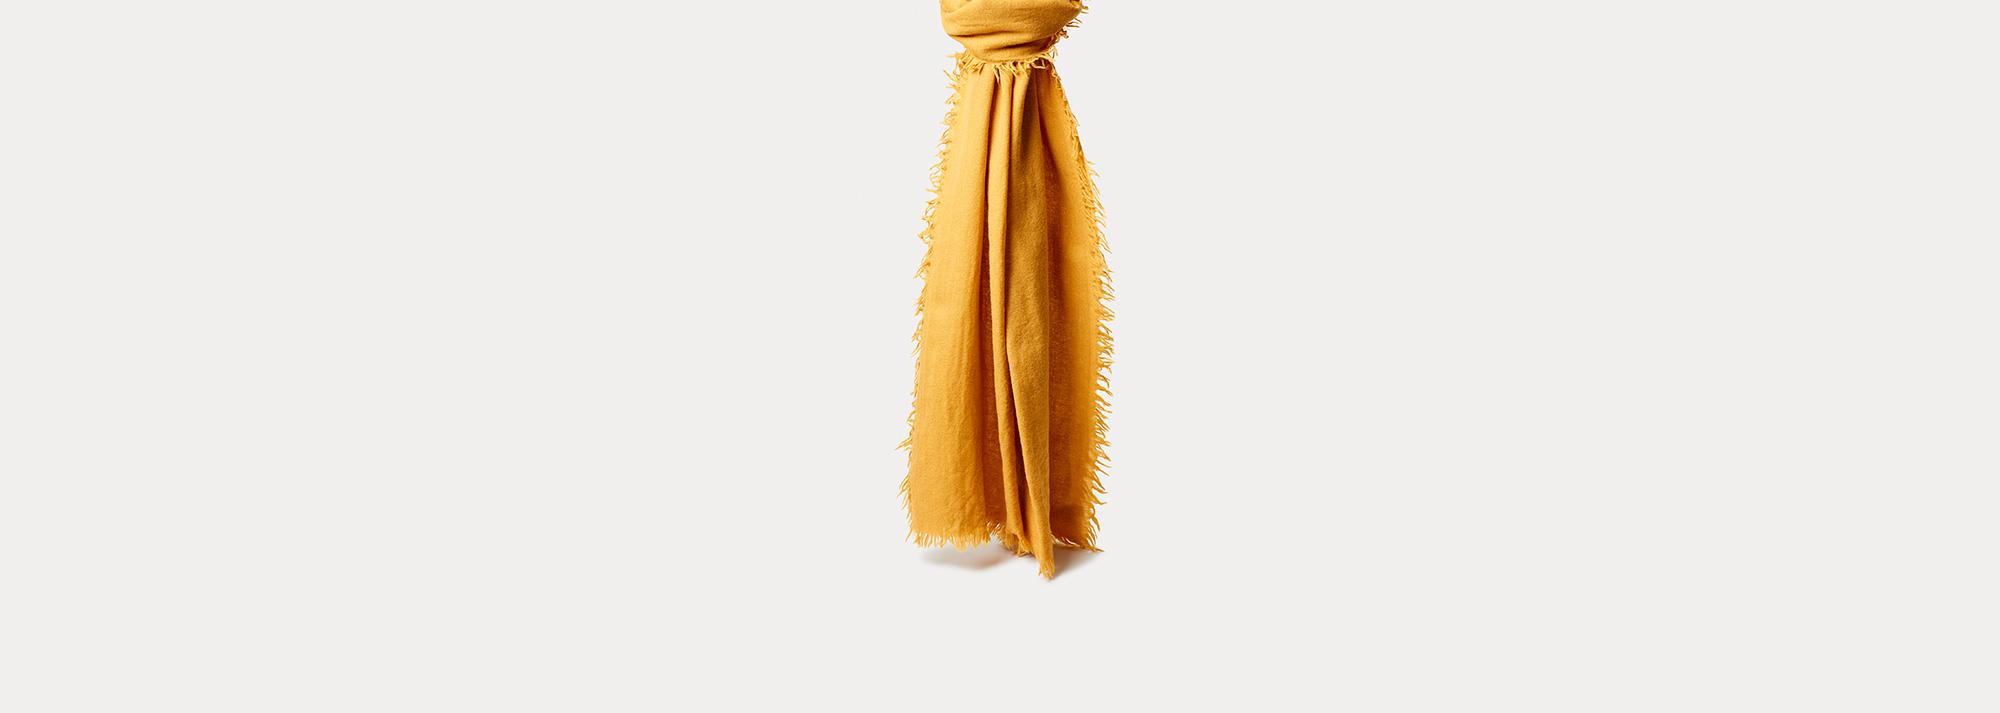 zimni saly nova kolekce cepice barety